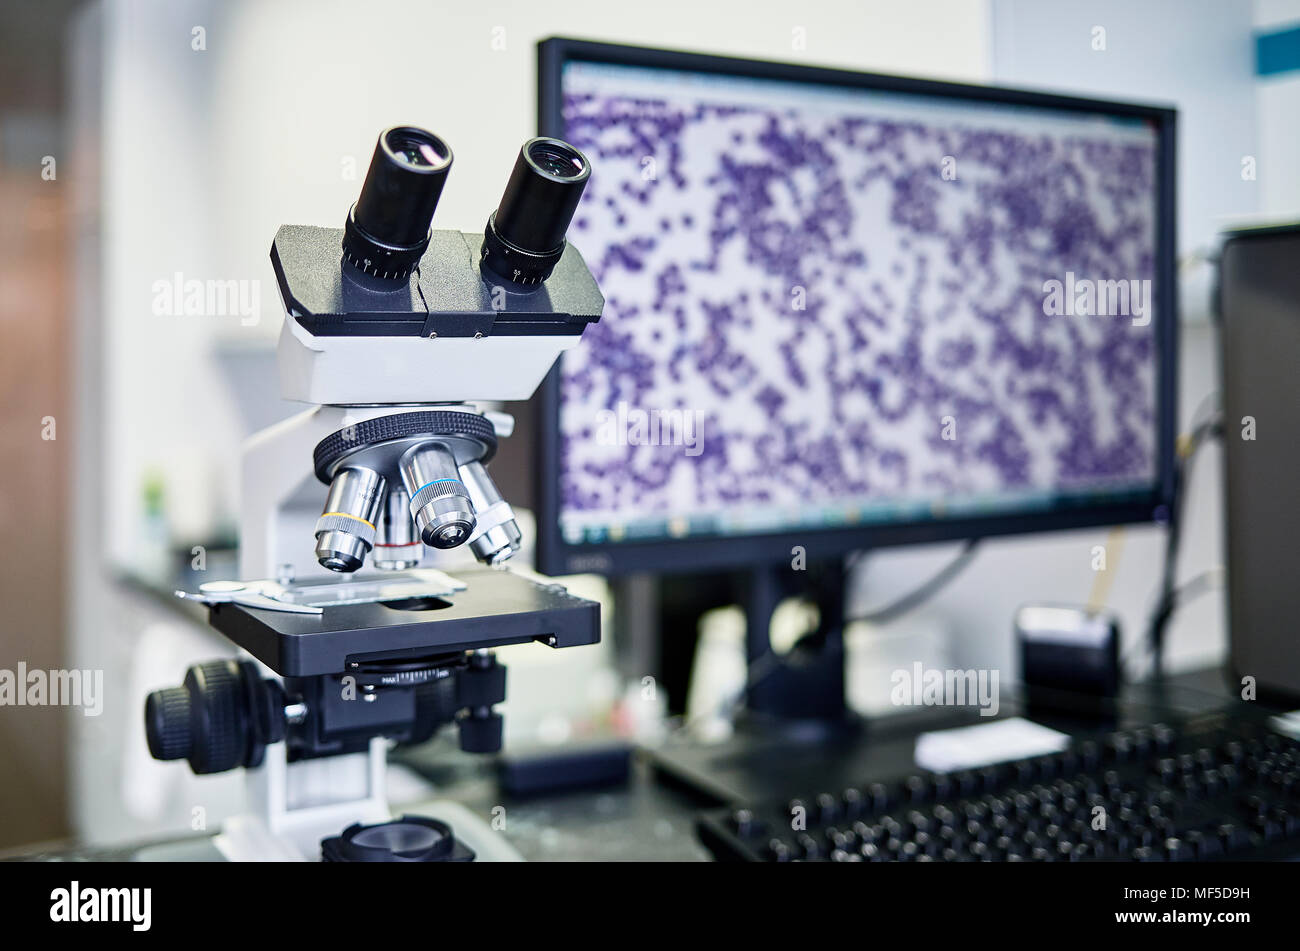 Veterinary practice, microscope and screen - Stock Image